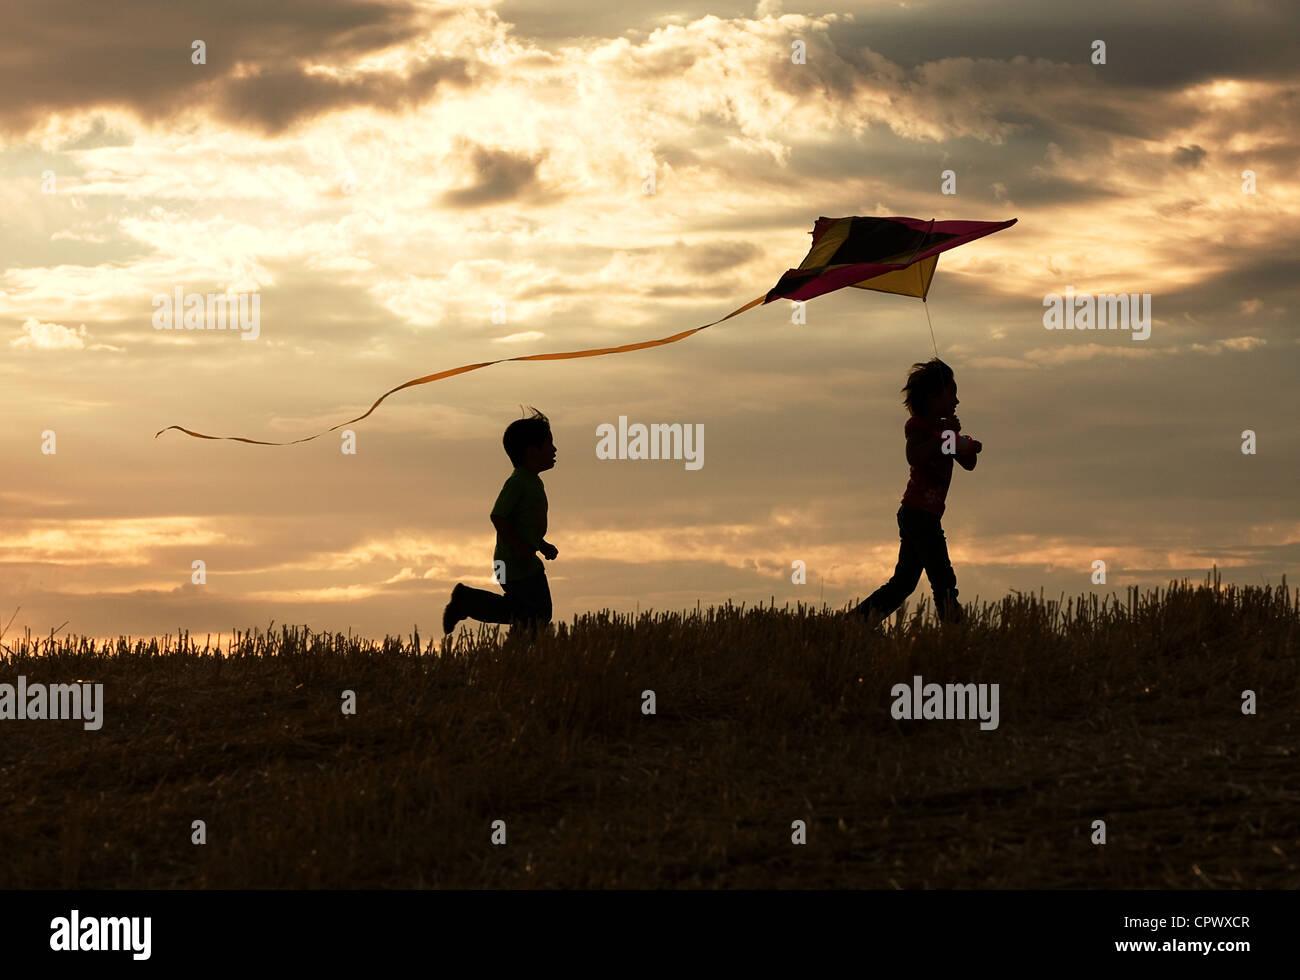 Two children enjoy flying a kite during sunset. - Stock Image